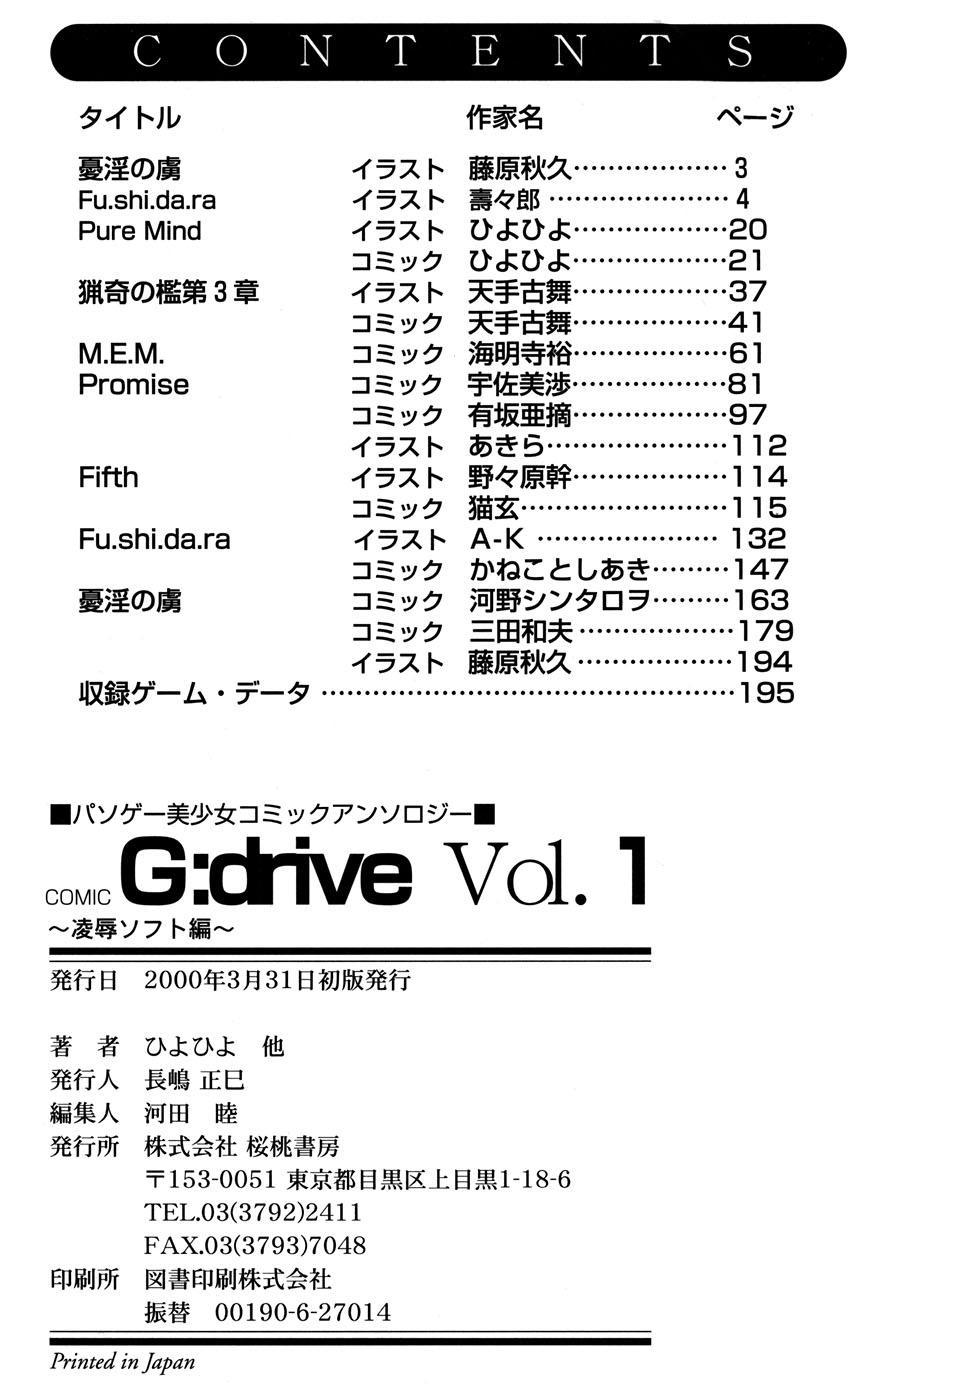 G-drive Vol.1 Ryoujokuhen 195